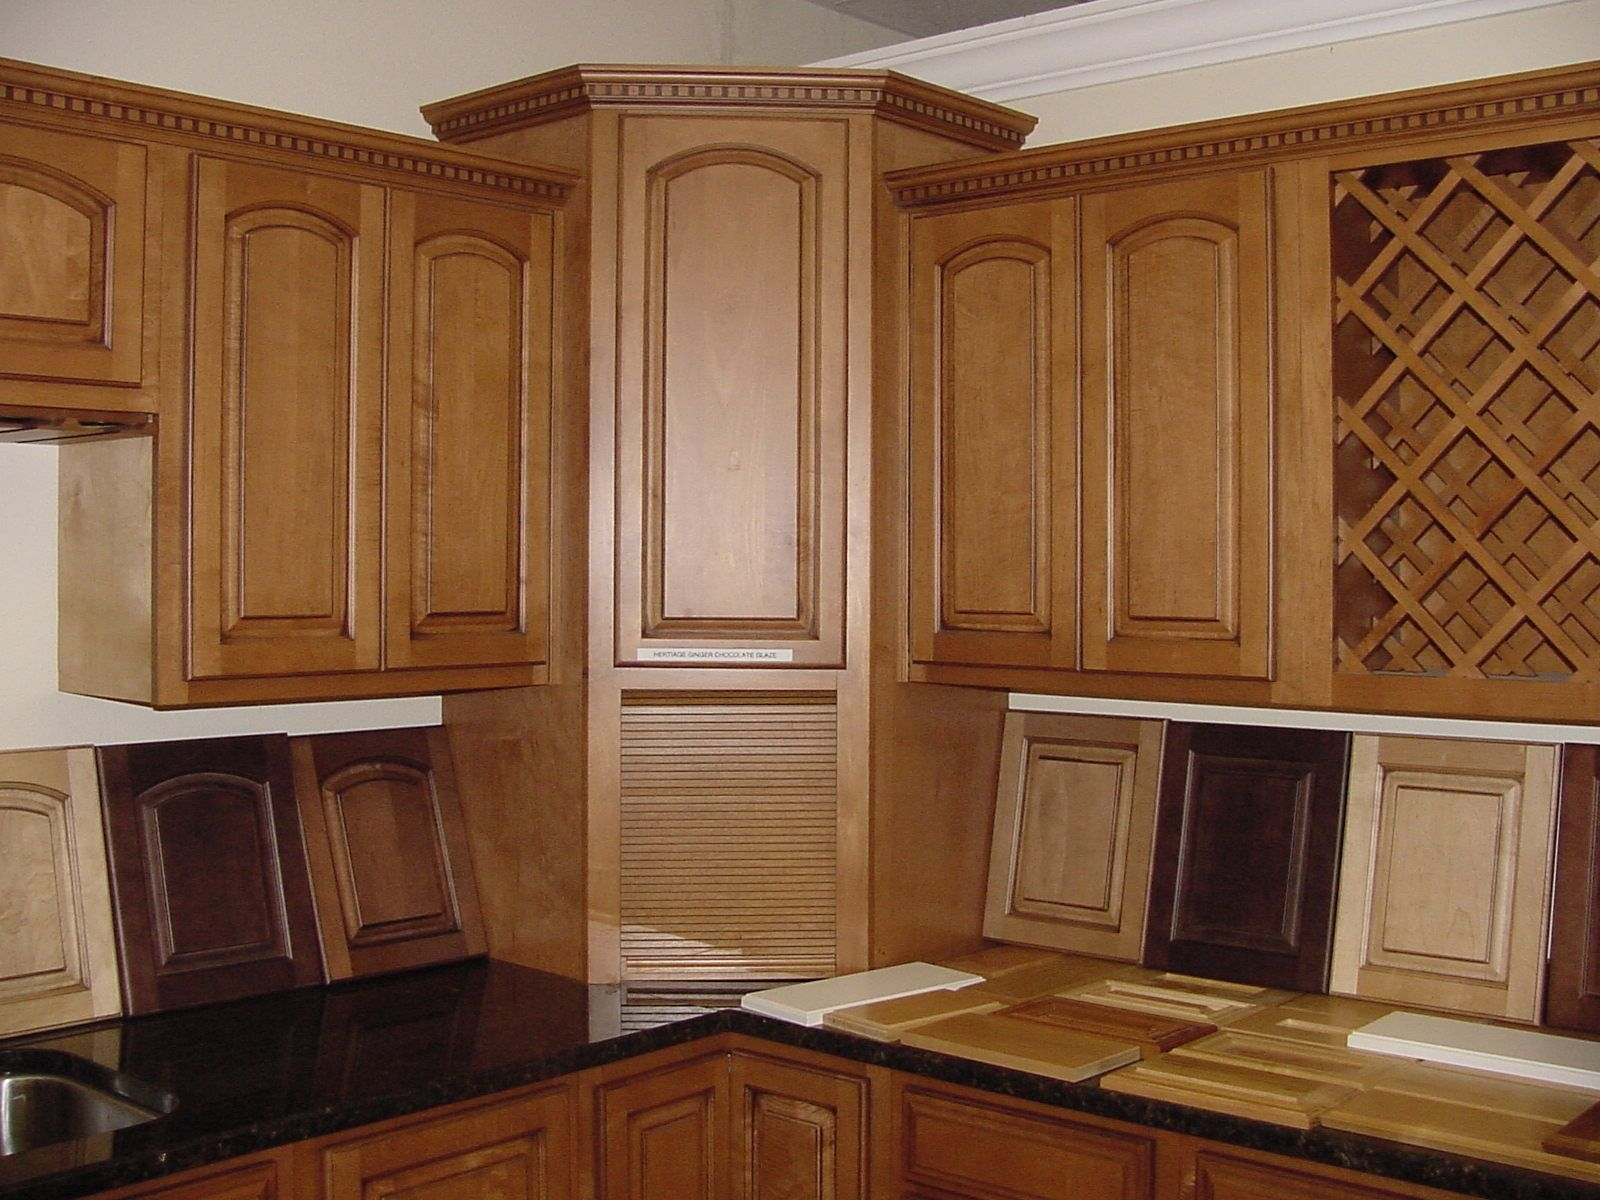 Corner Kitchen Cabinet Decoration Thrift Folding | cozinha | Pinterest